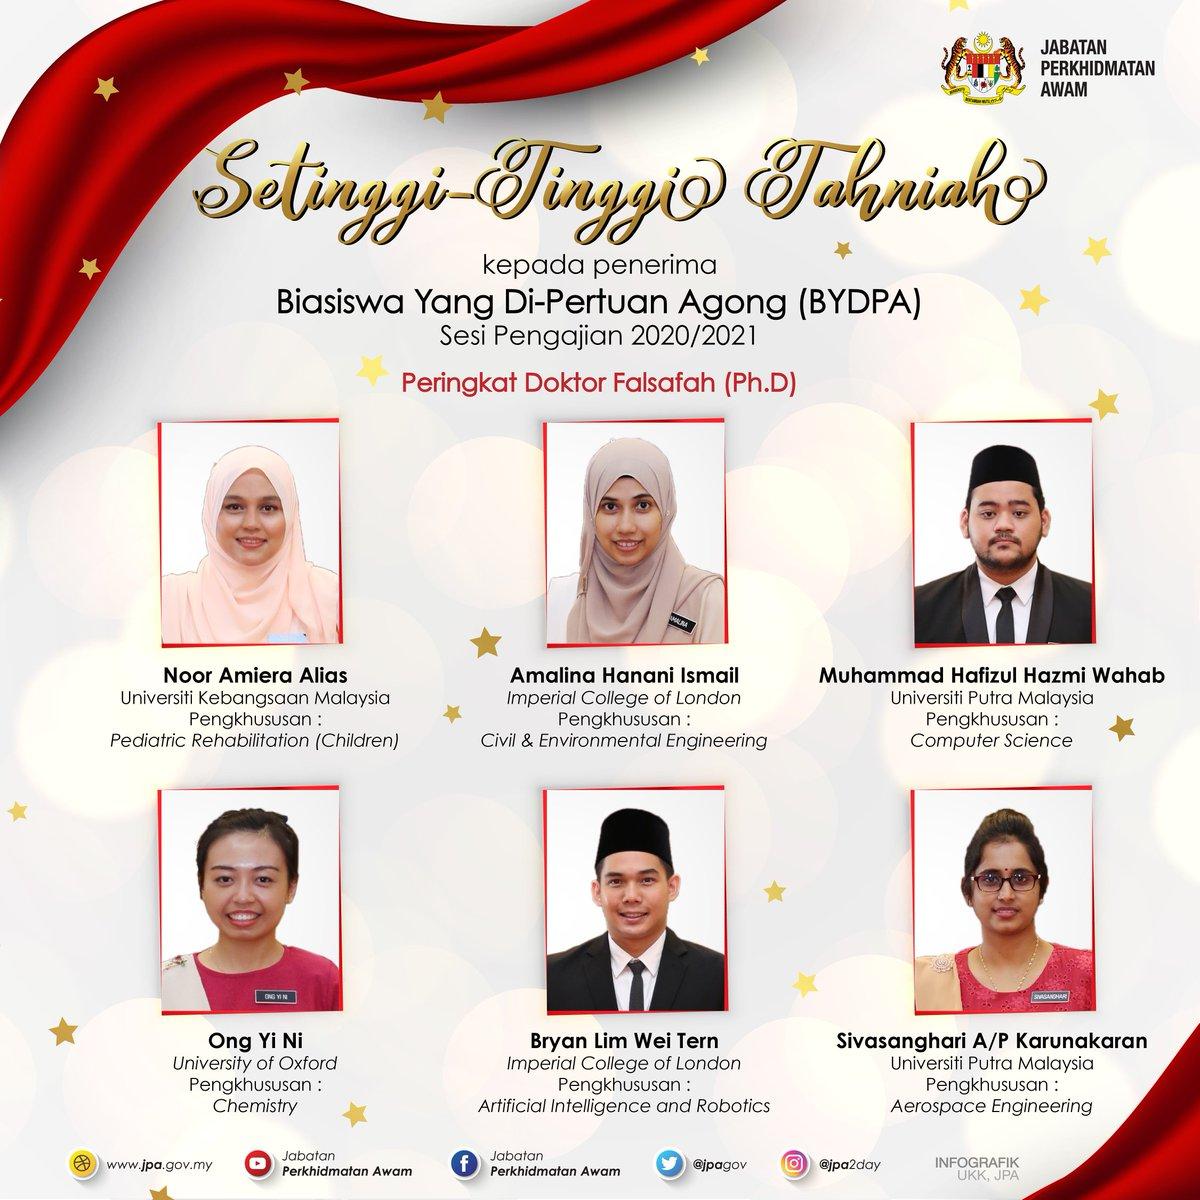 Jab Per Awam Jpa On Twitter Majlis Penganugerahan Biasiswa Yang Di Pertuan Agong Sesi Pengajian 2020 2021 Kredit Video Istana Negara